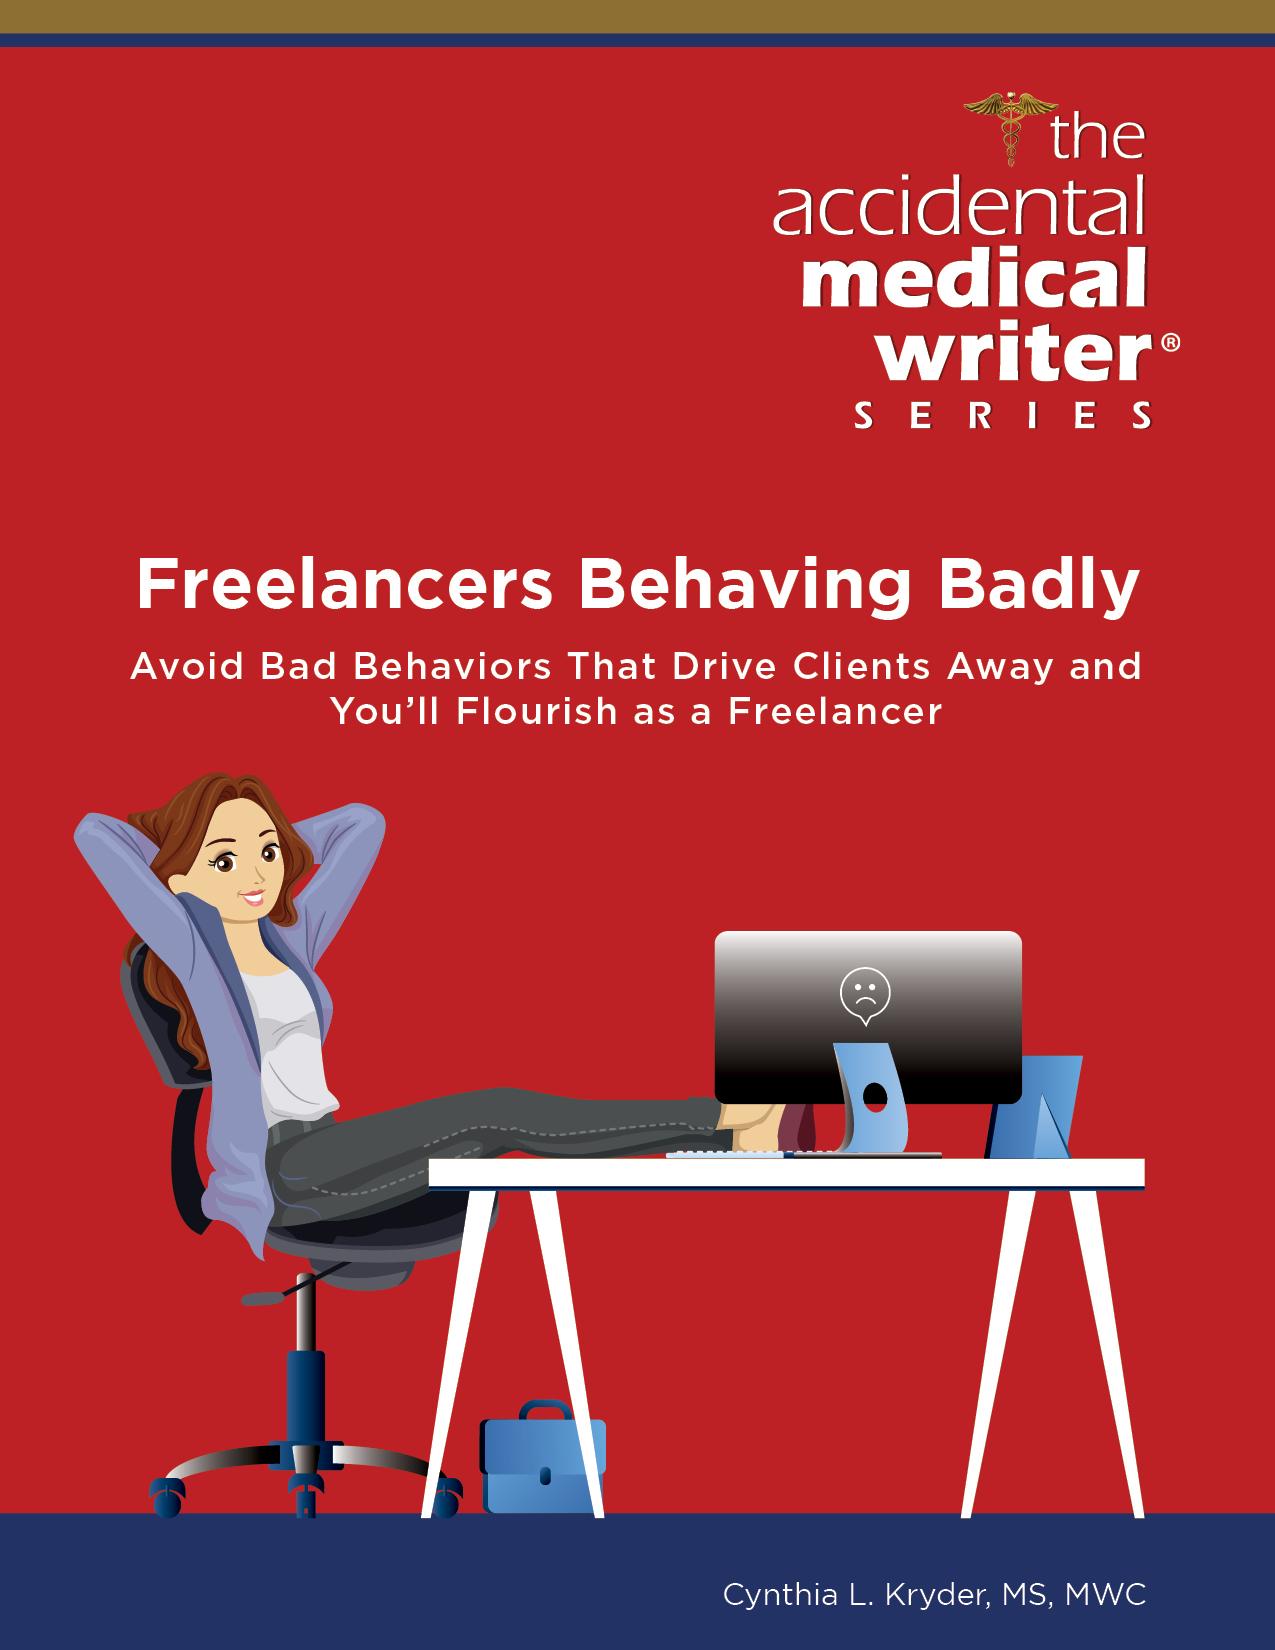 freelancersbehavingbadly